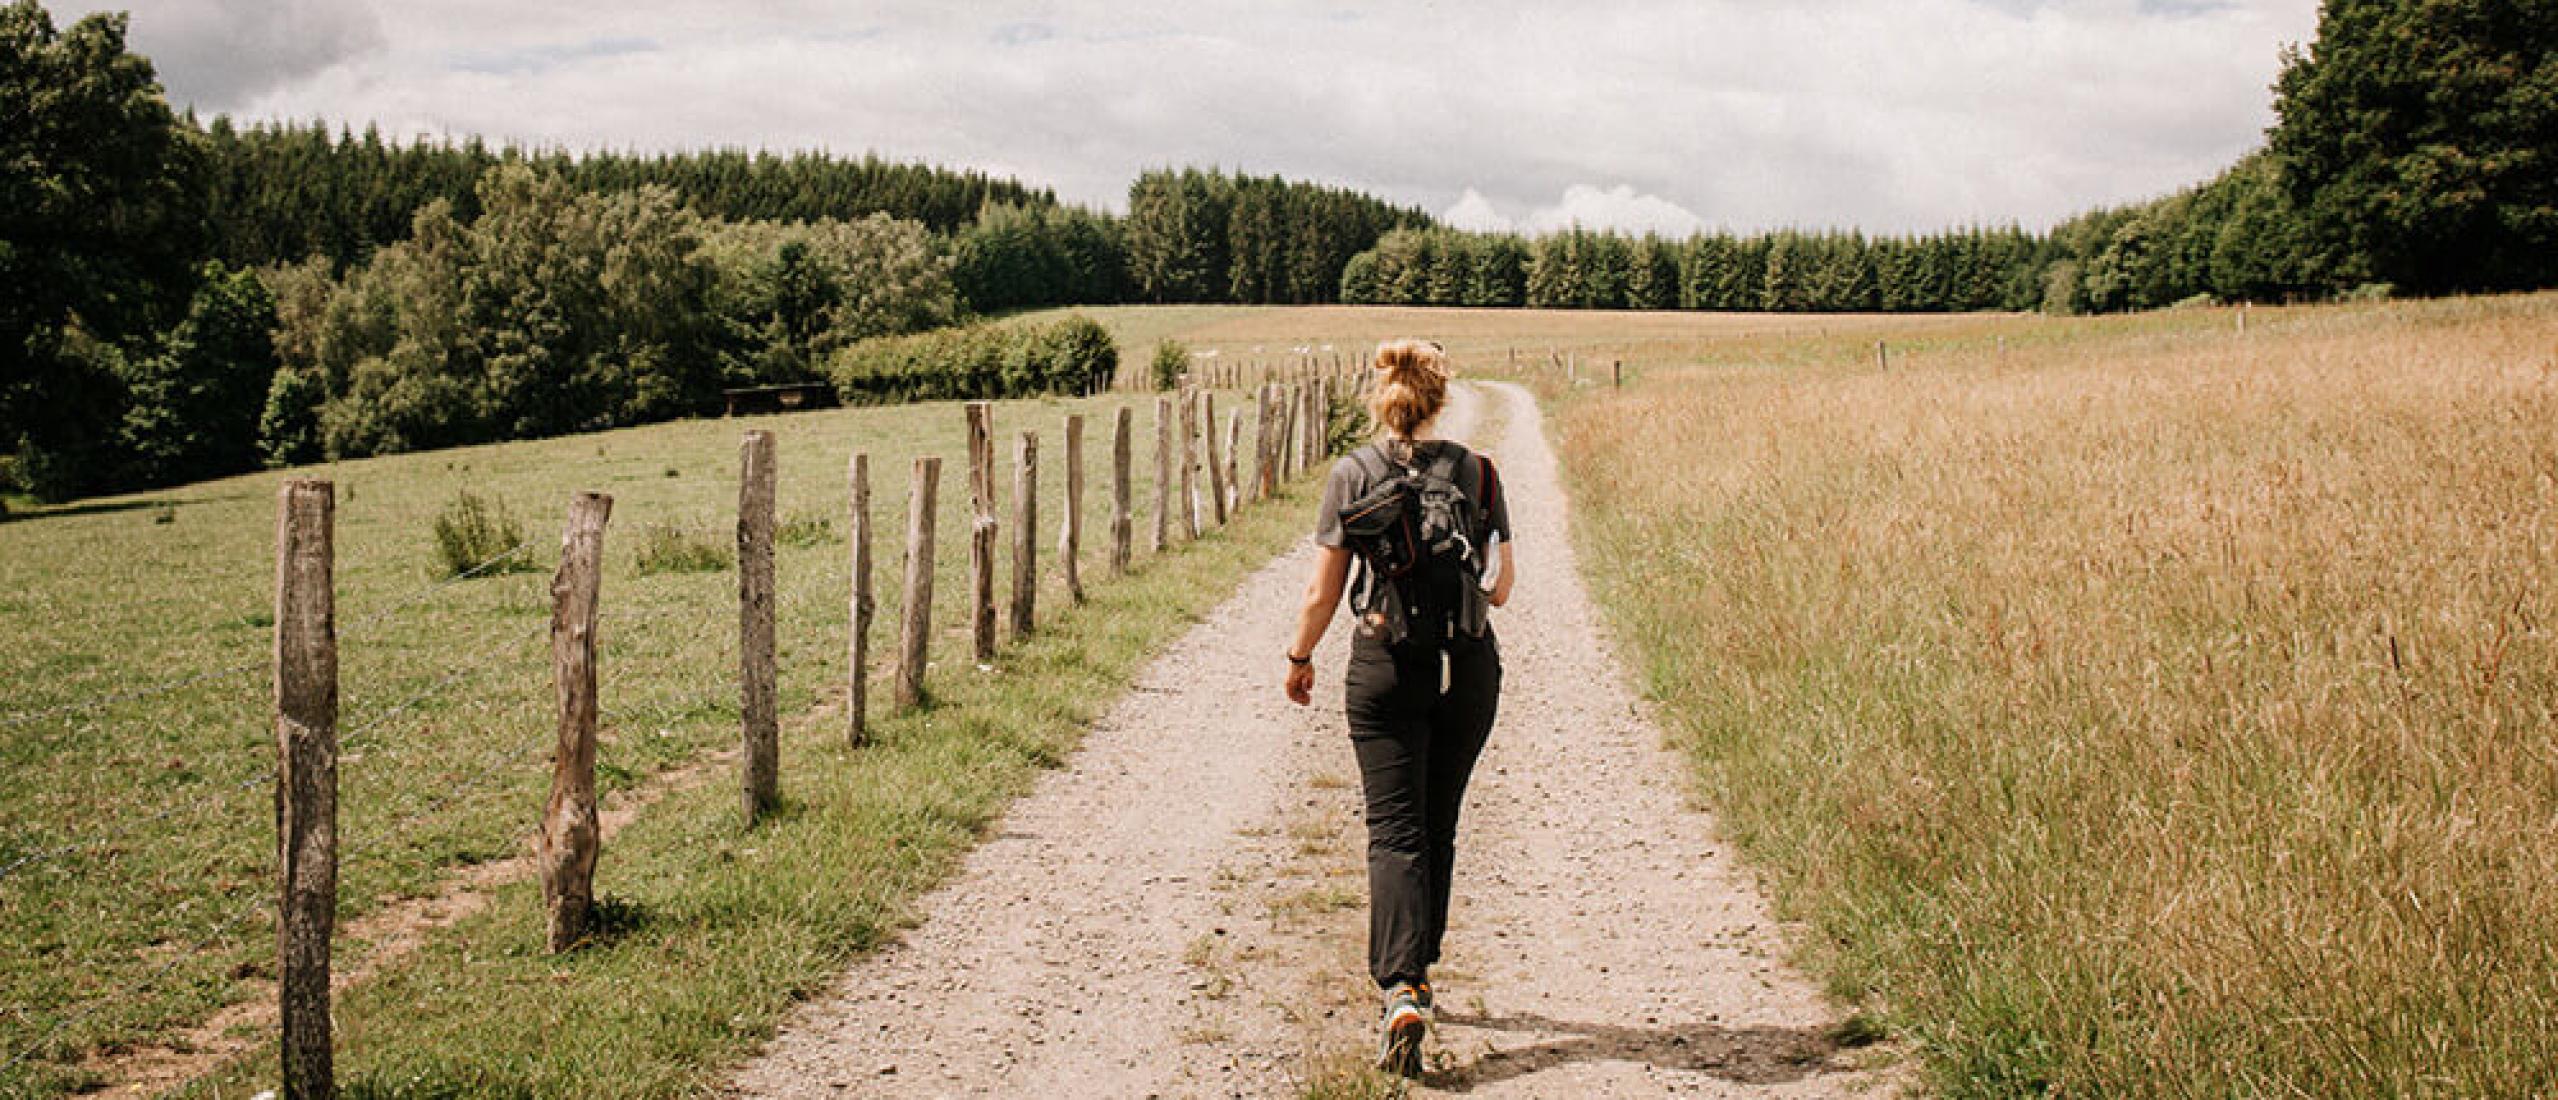 Meerdaagse wandelroutes in België